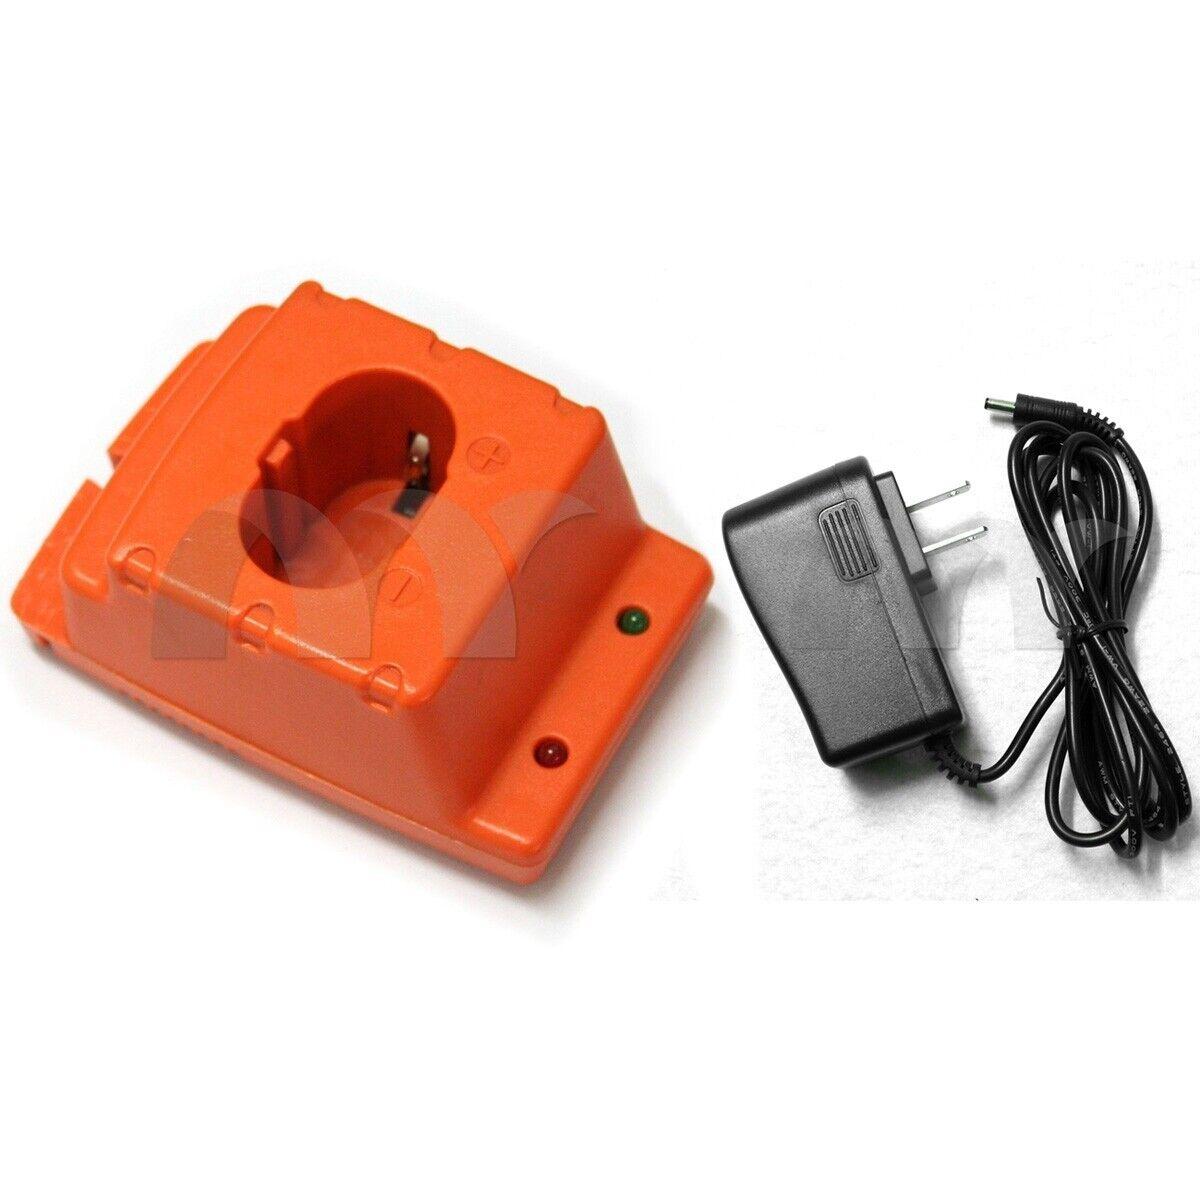 Battery Charger,6V, For PASLODE 902200 900420 B20540 IM350